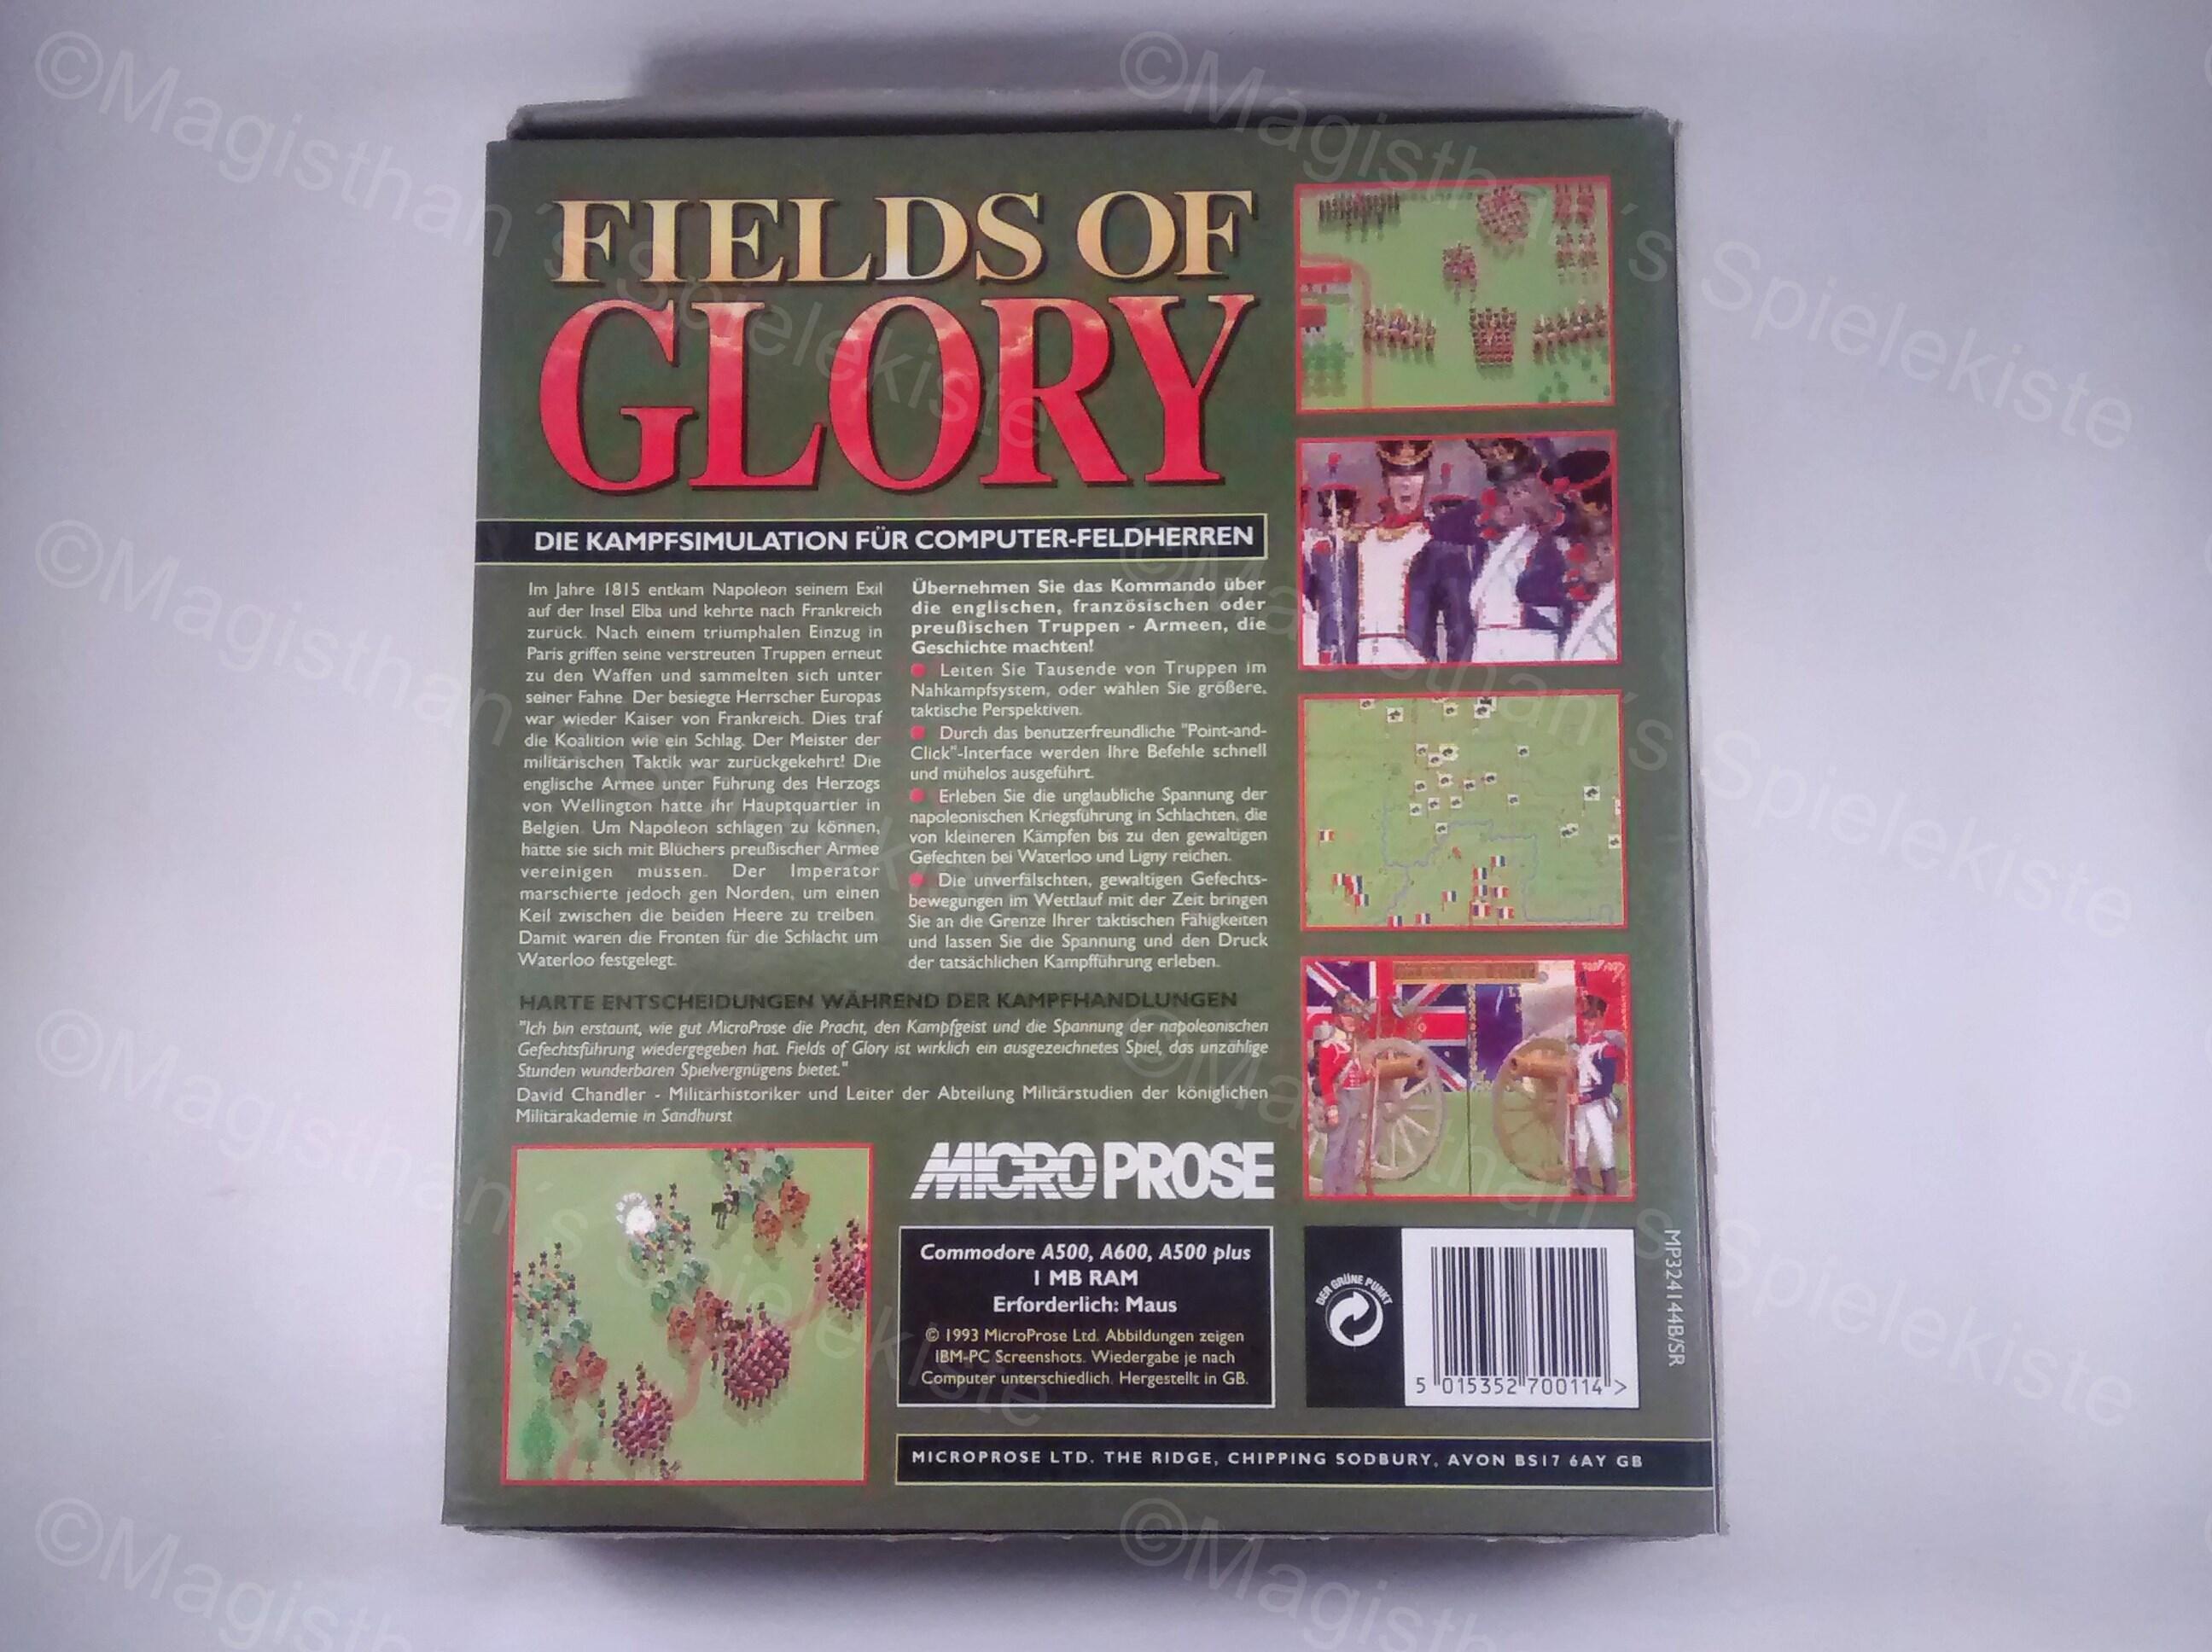 FieldsofGlory1_back.jpg